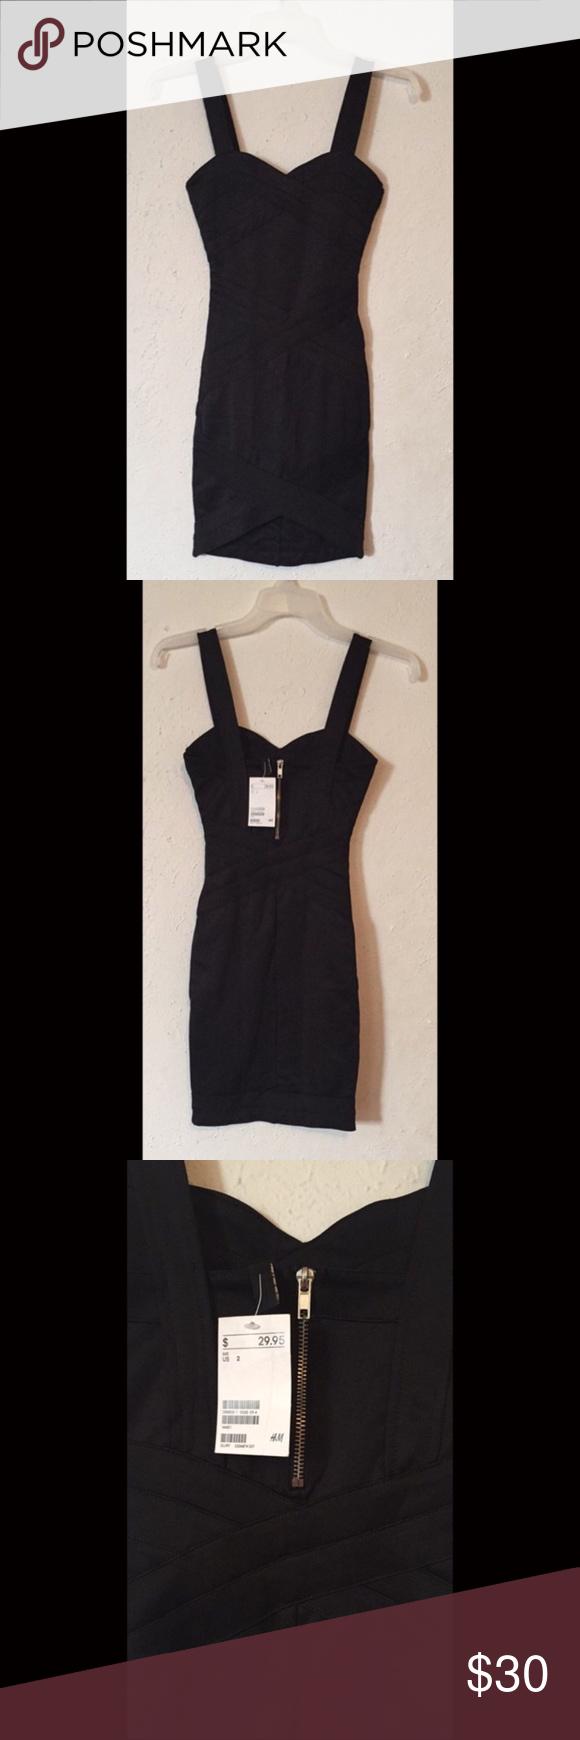 Little black dress Brand new Little black dress size 2 H&M Dresses Mini